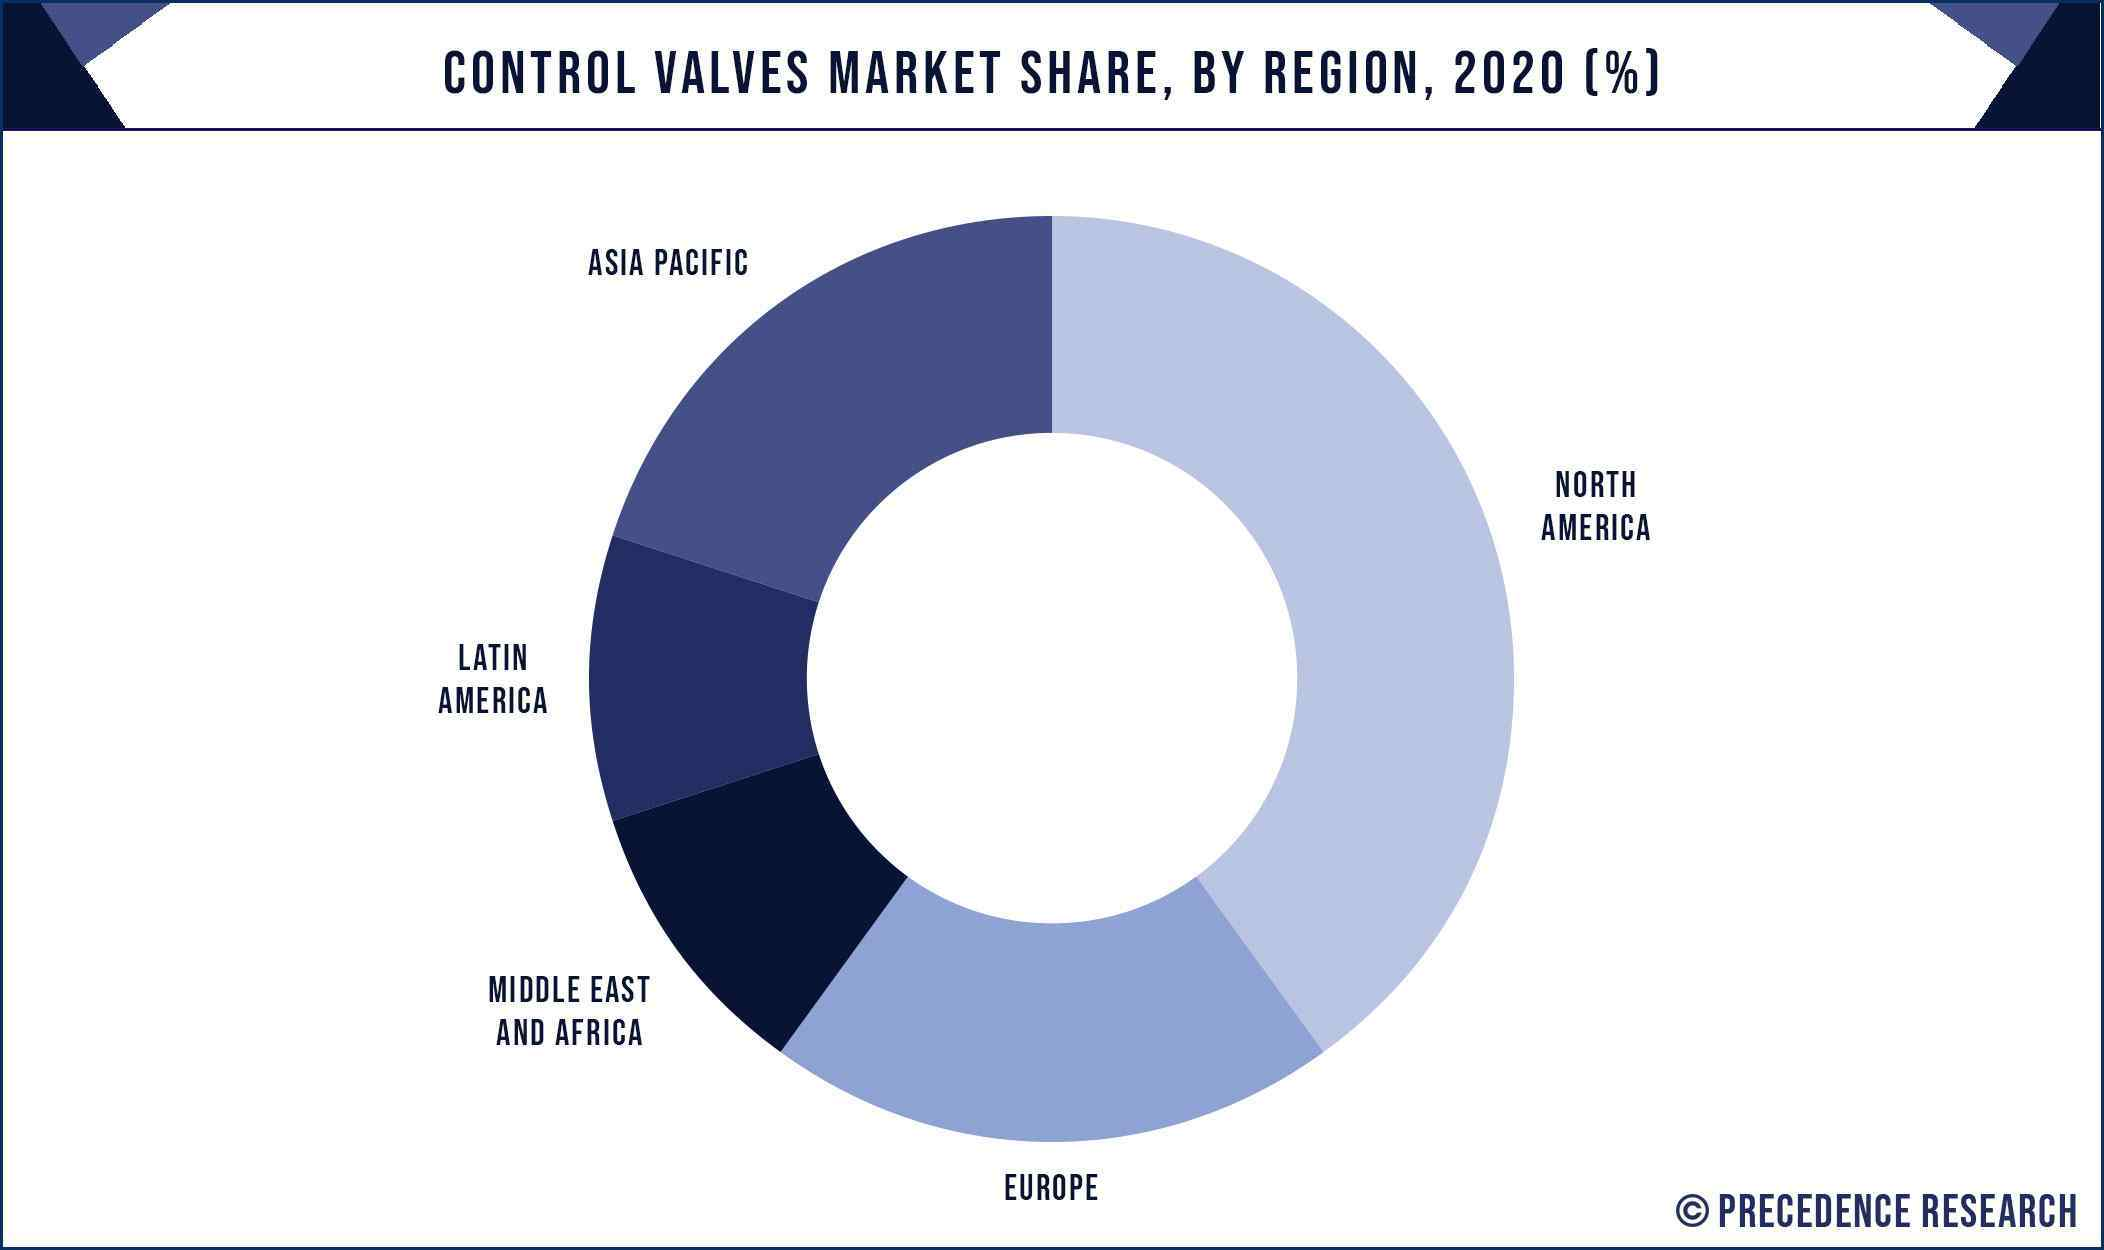 Control Valves Market Share, By Region, 2020 (%)